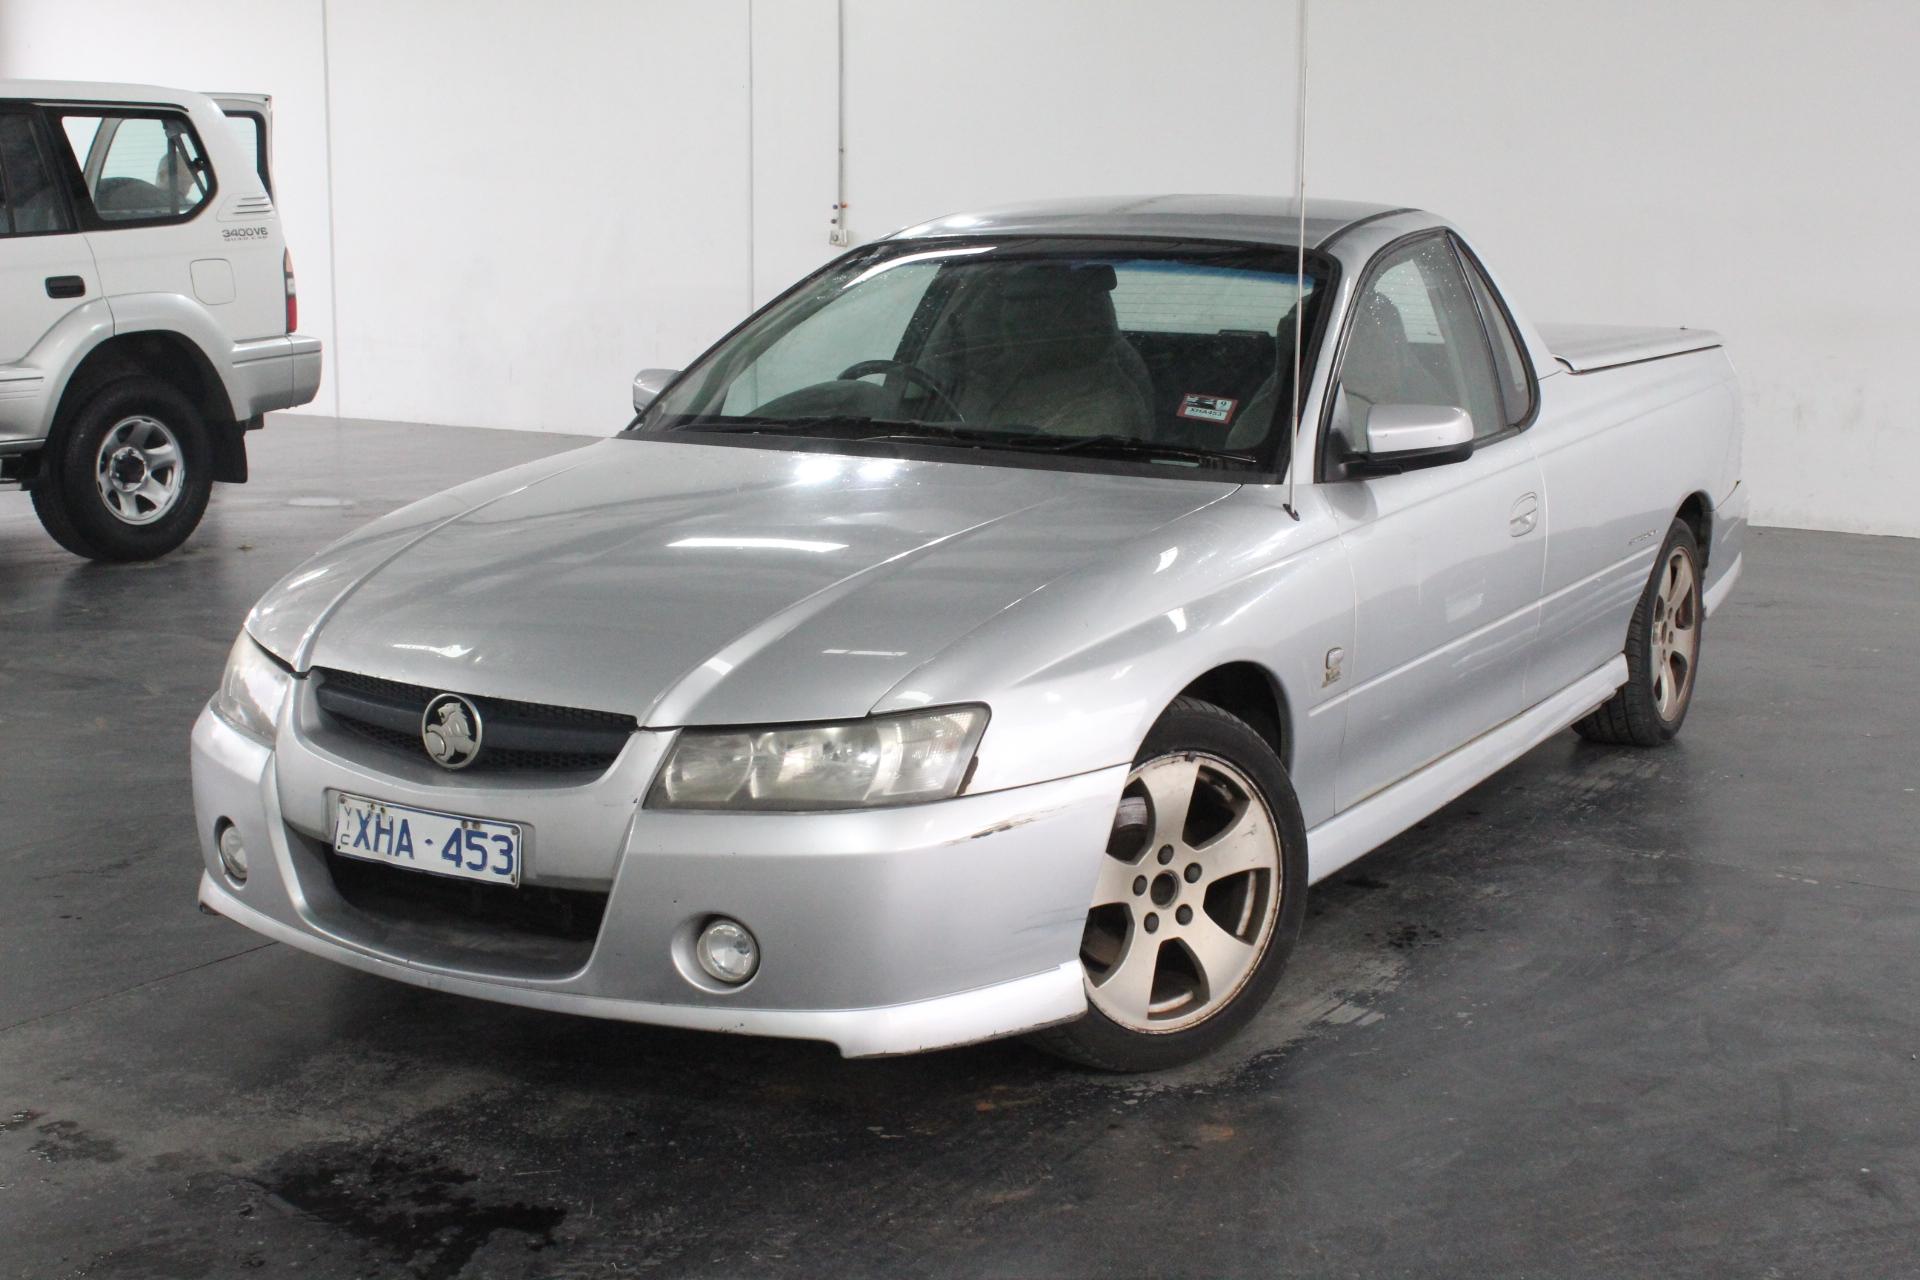 2005 Holden Commodore S VZ Automatic Ute